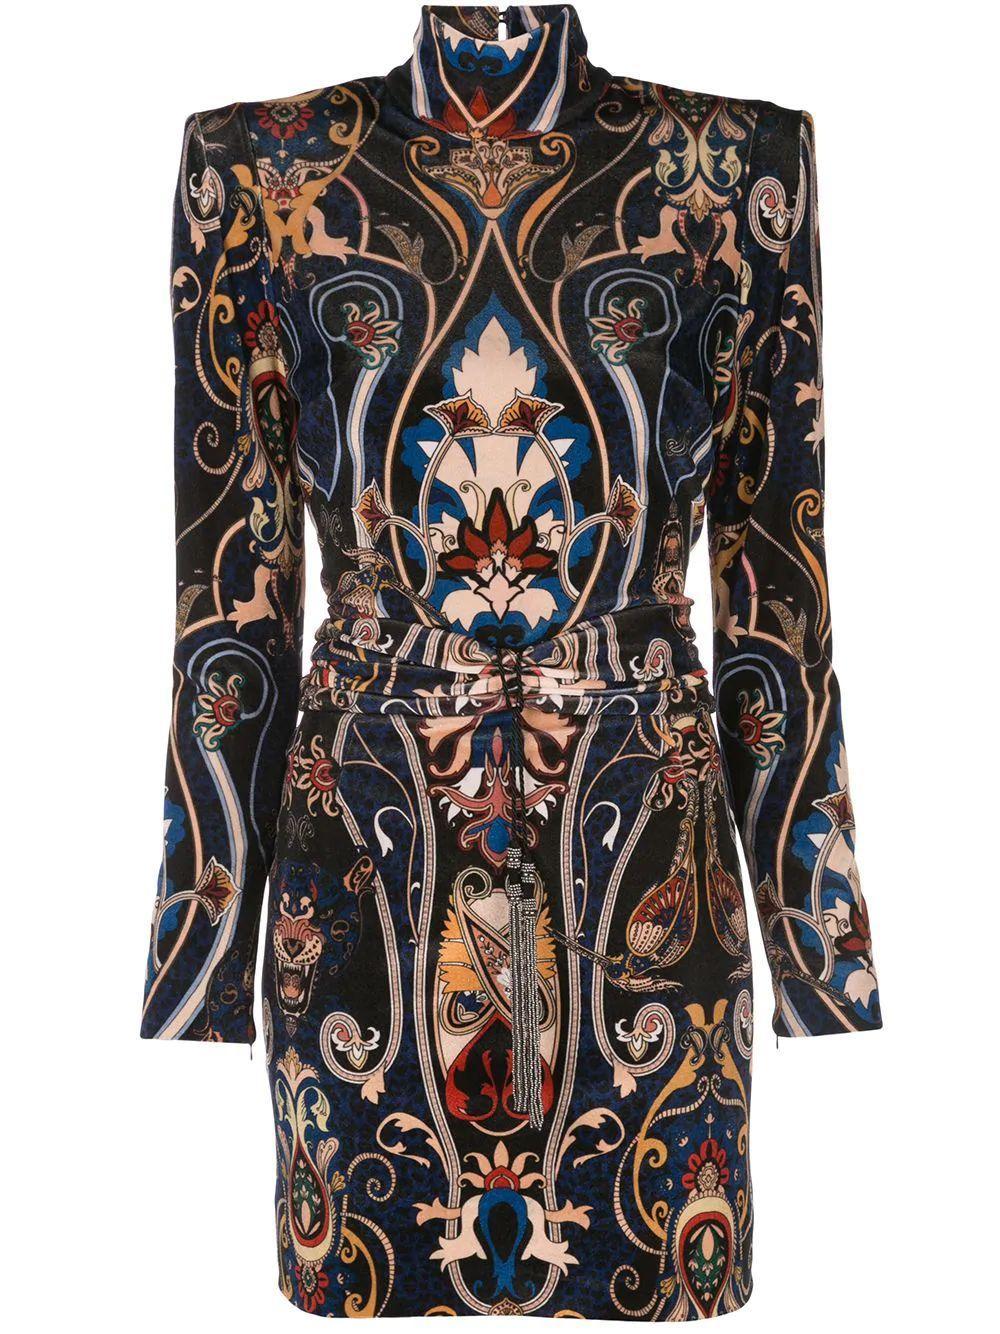 Long Sleeve Printed Velvet Short Dress With Lace Back